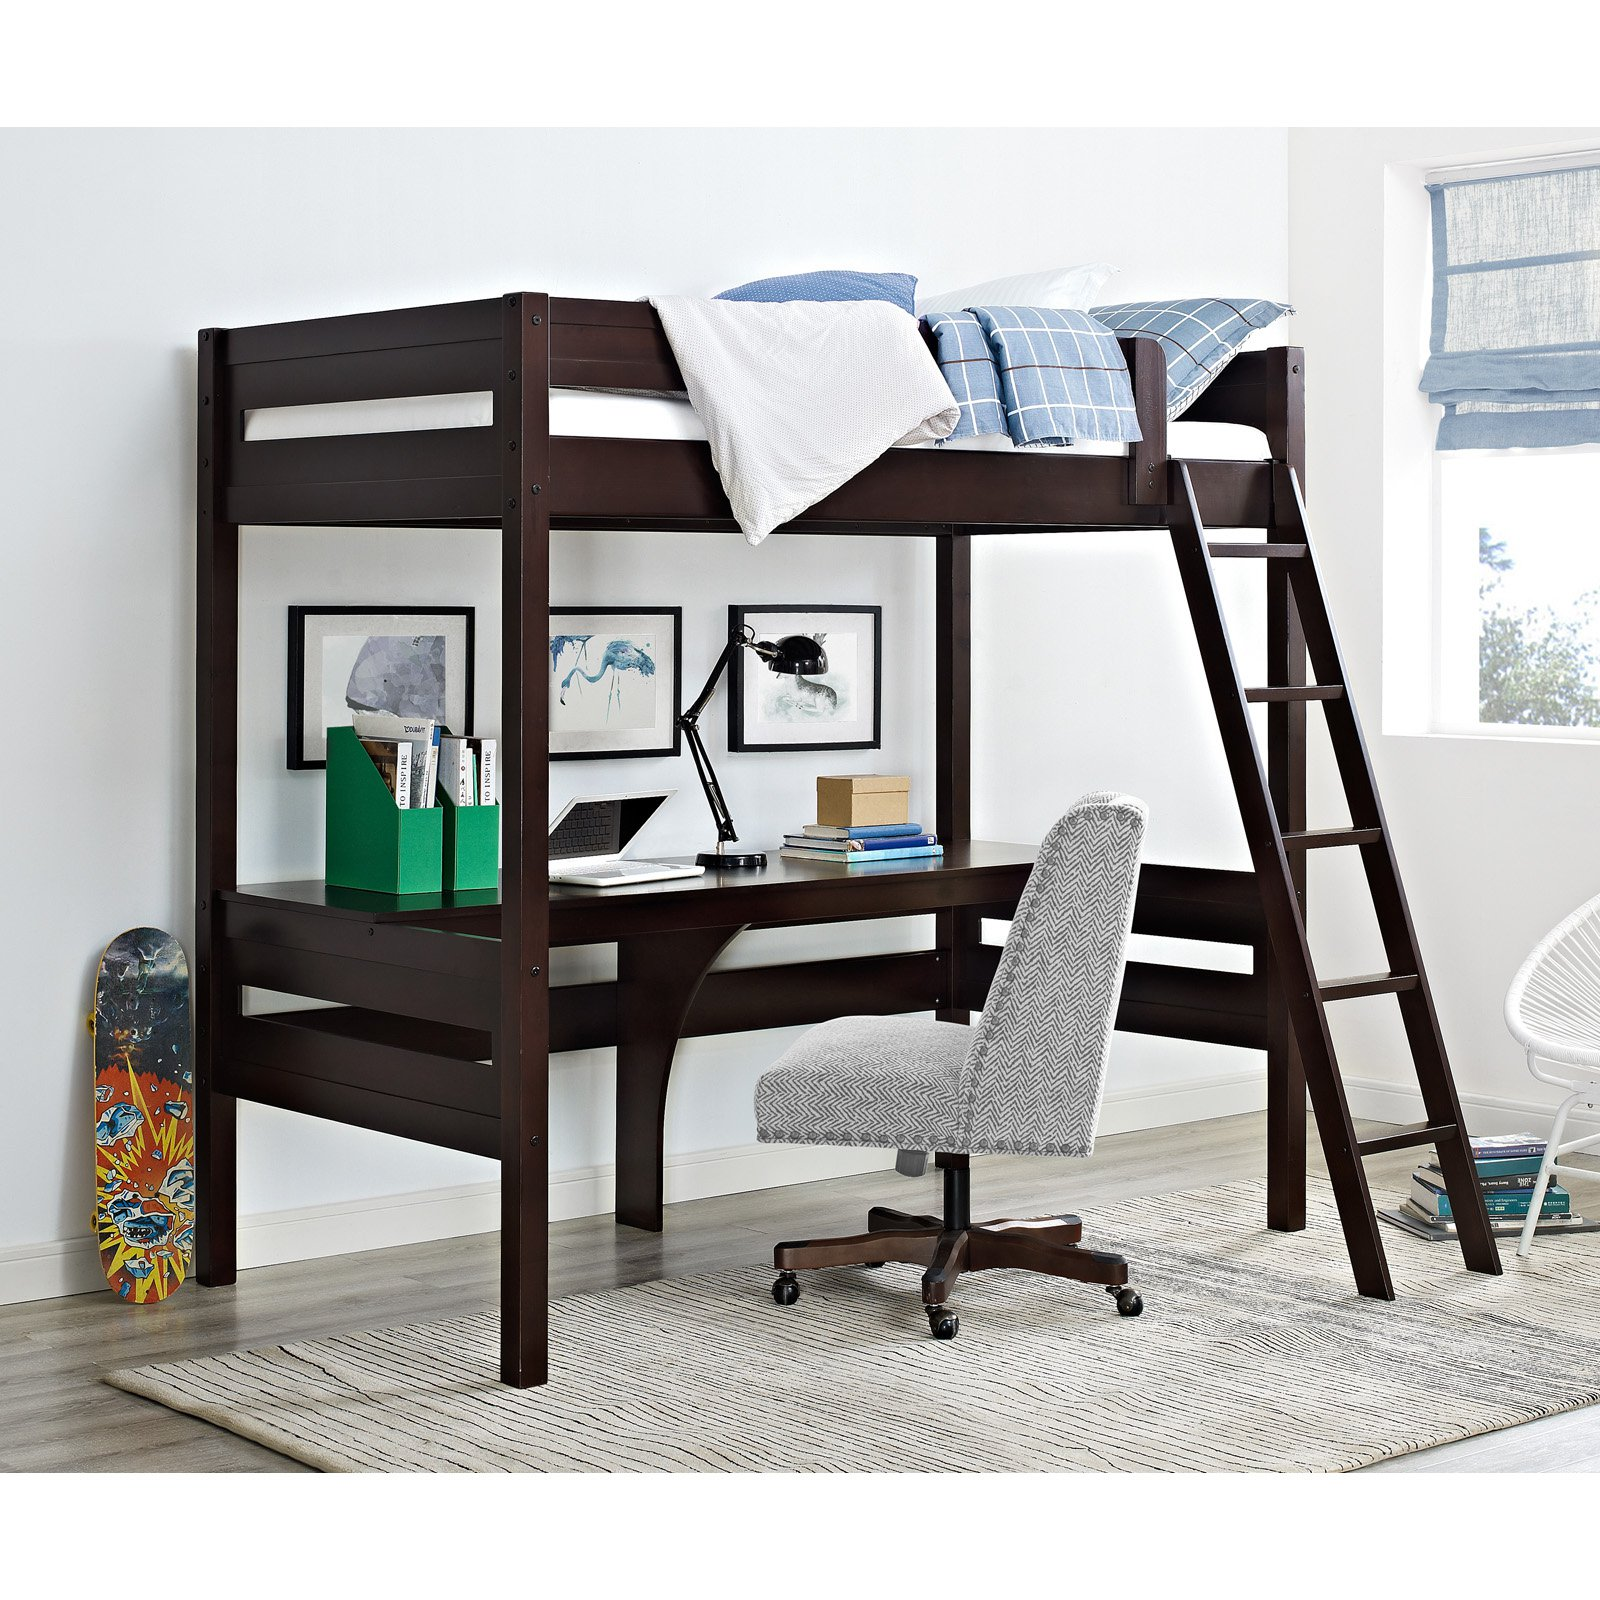 Dorel Living Harlan Twin Wood Loft Bed with Desk, Espresso